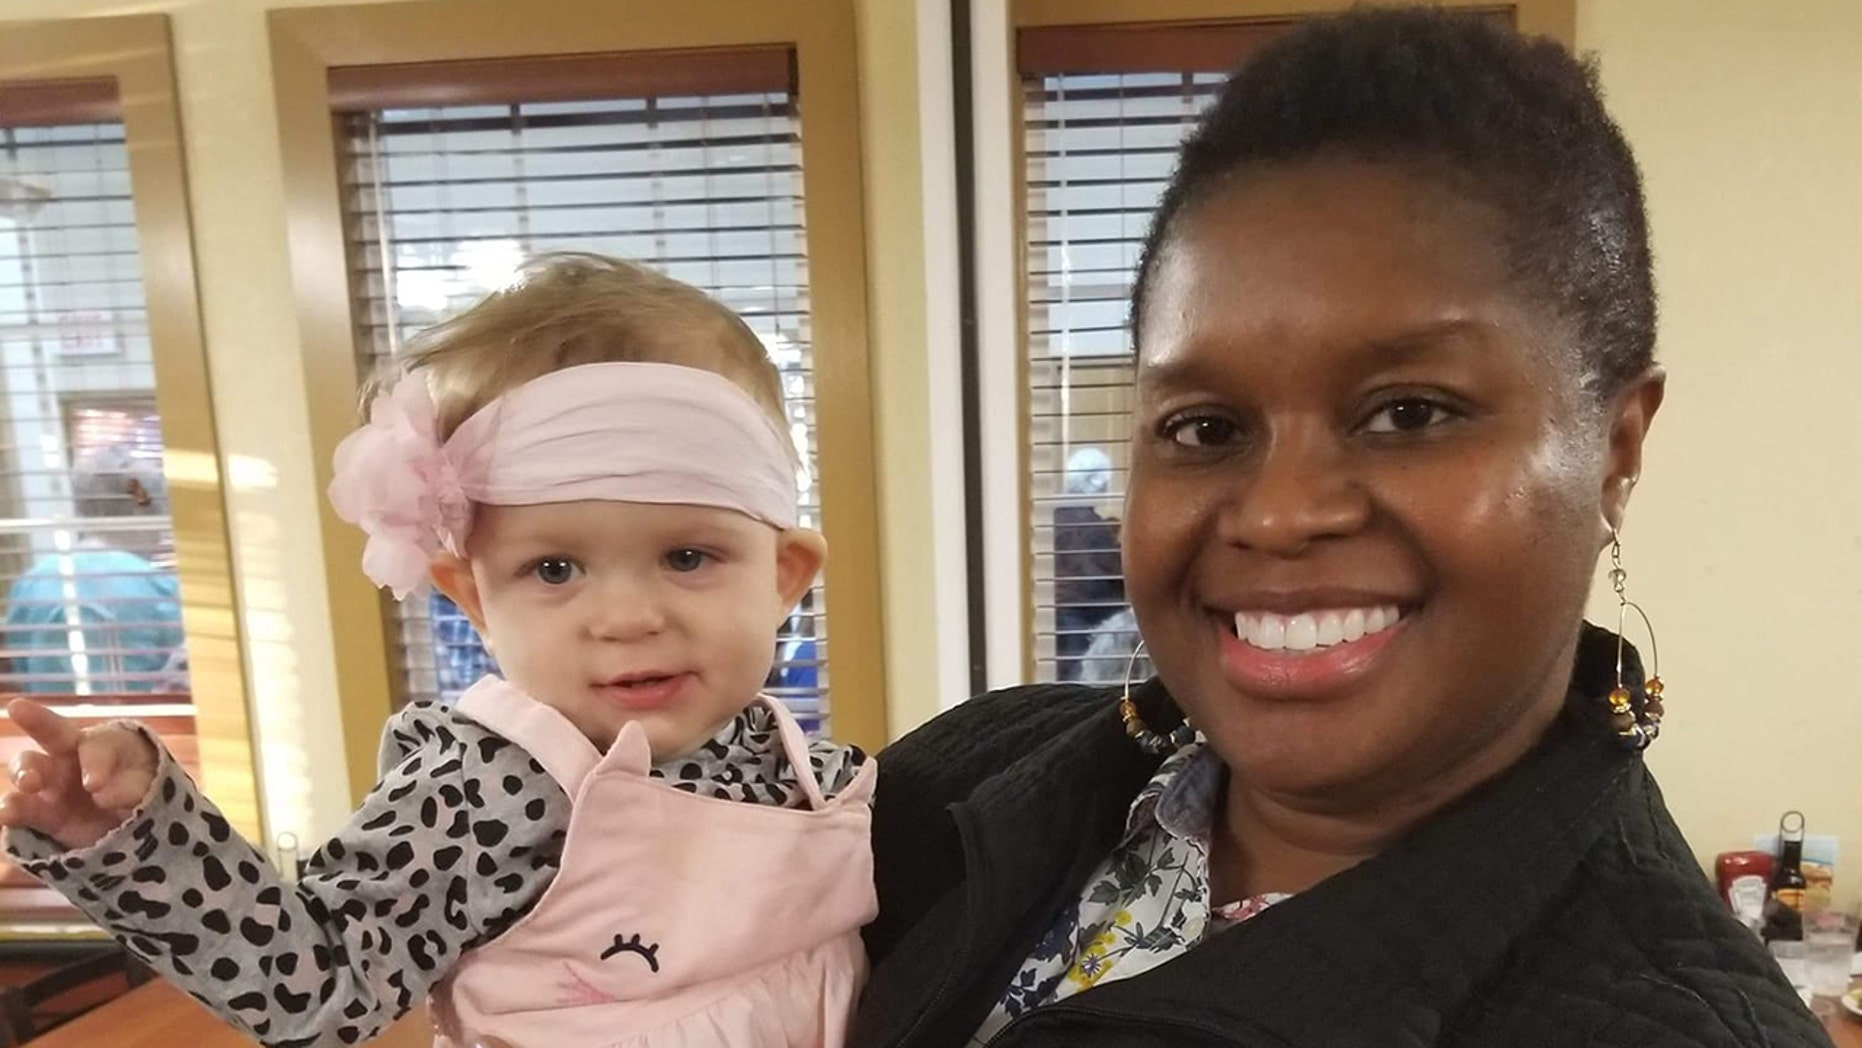 Deborah Rouse's quick thinking saved baby Calli's life on Thanksgiving.